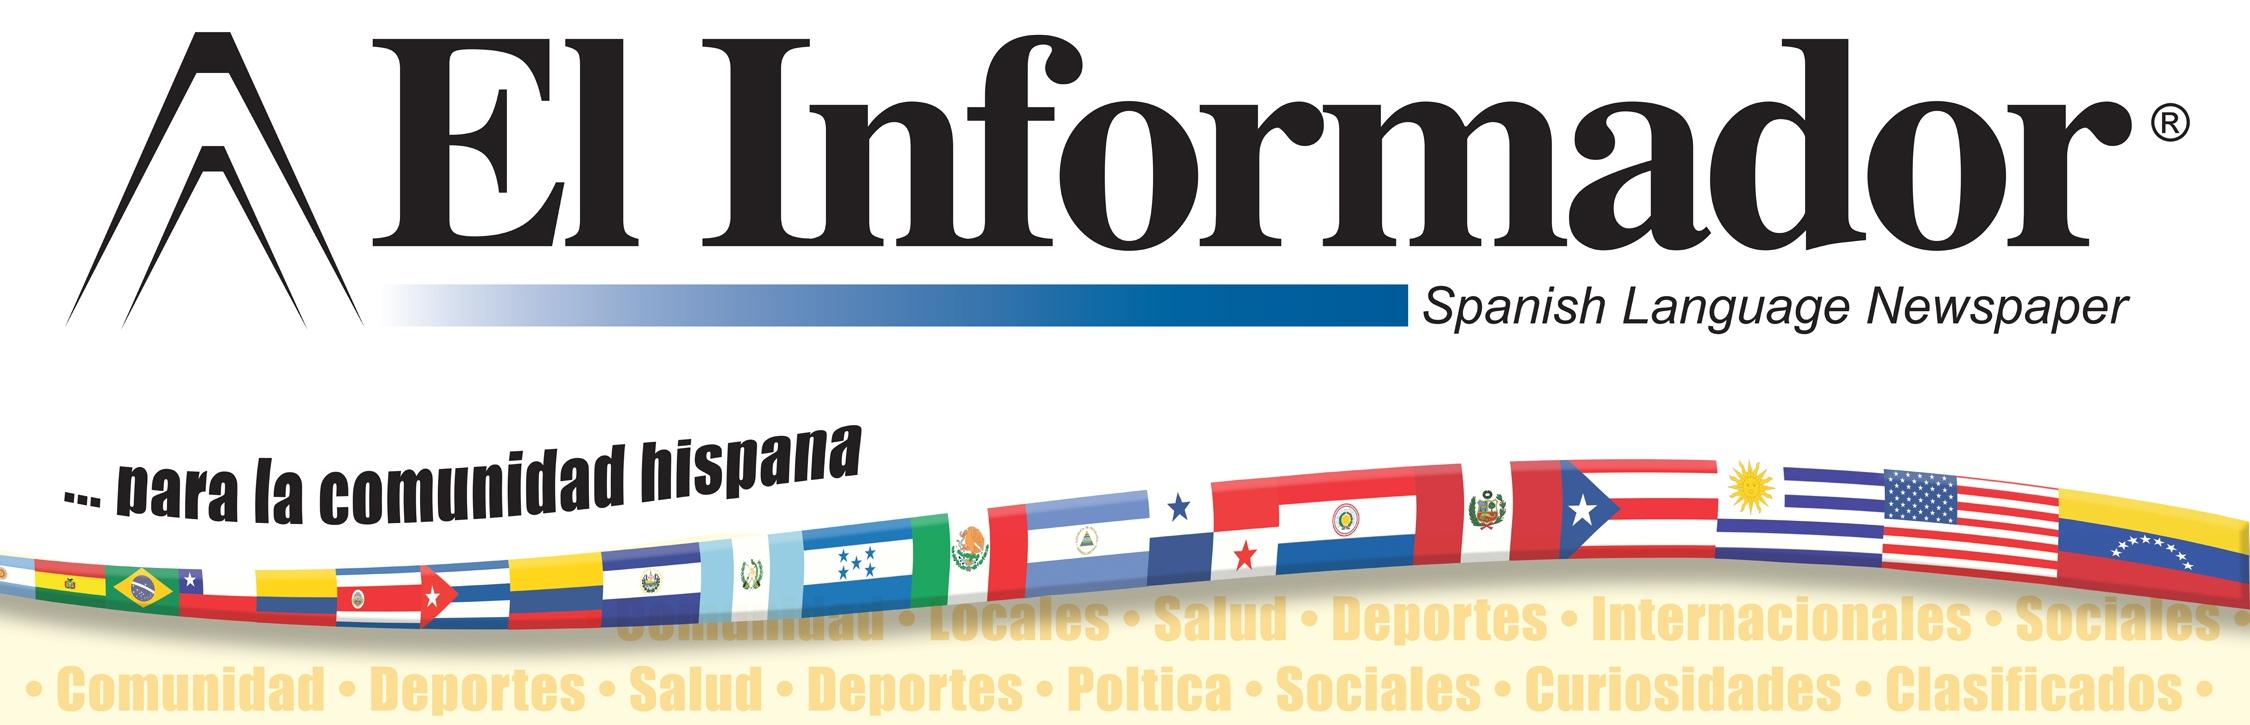 El Informador Newspaper image 4